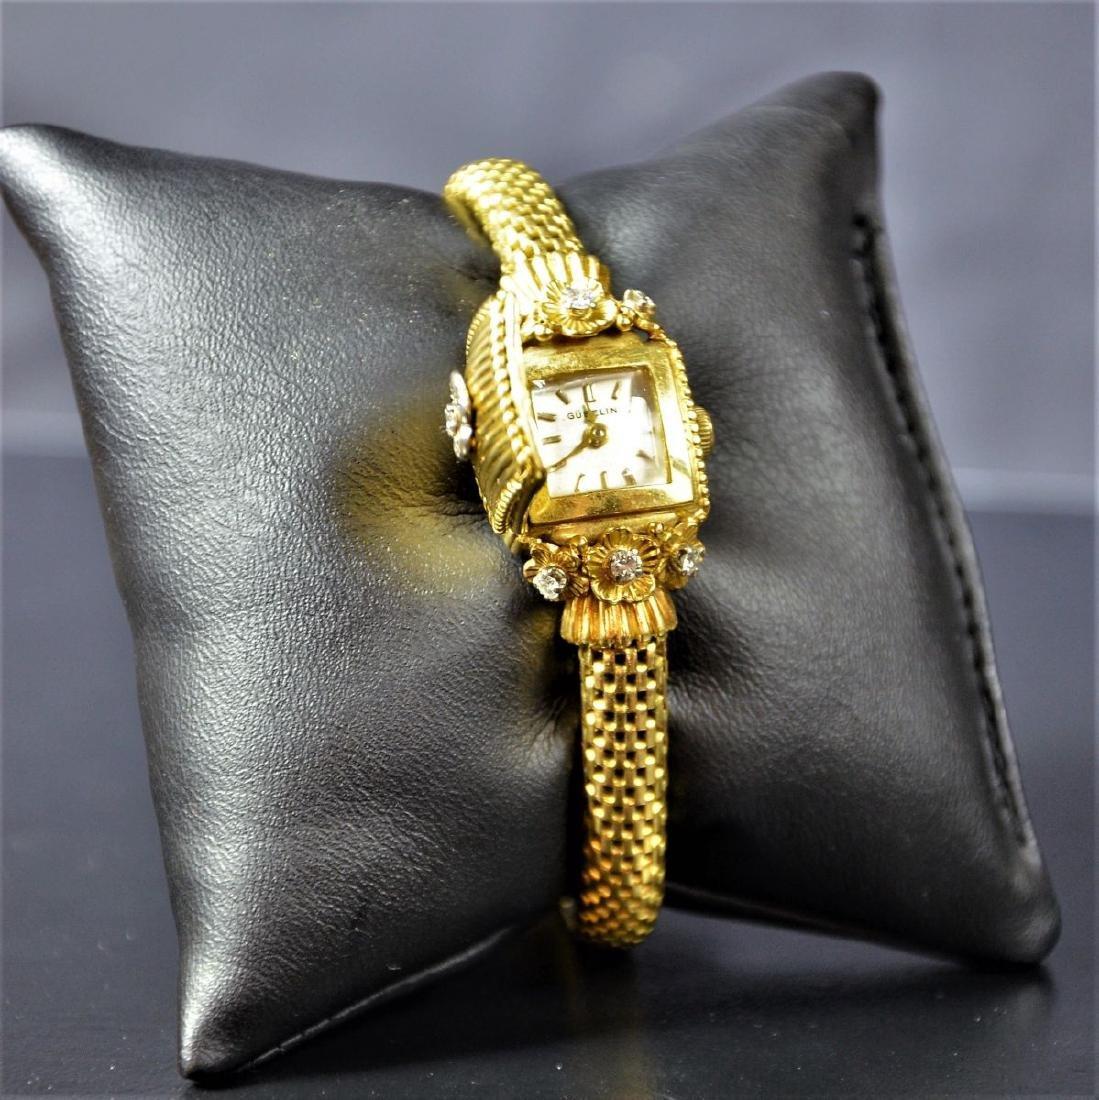 18ct (36 g) gold jewelry watch with diamonds GUBELIN.